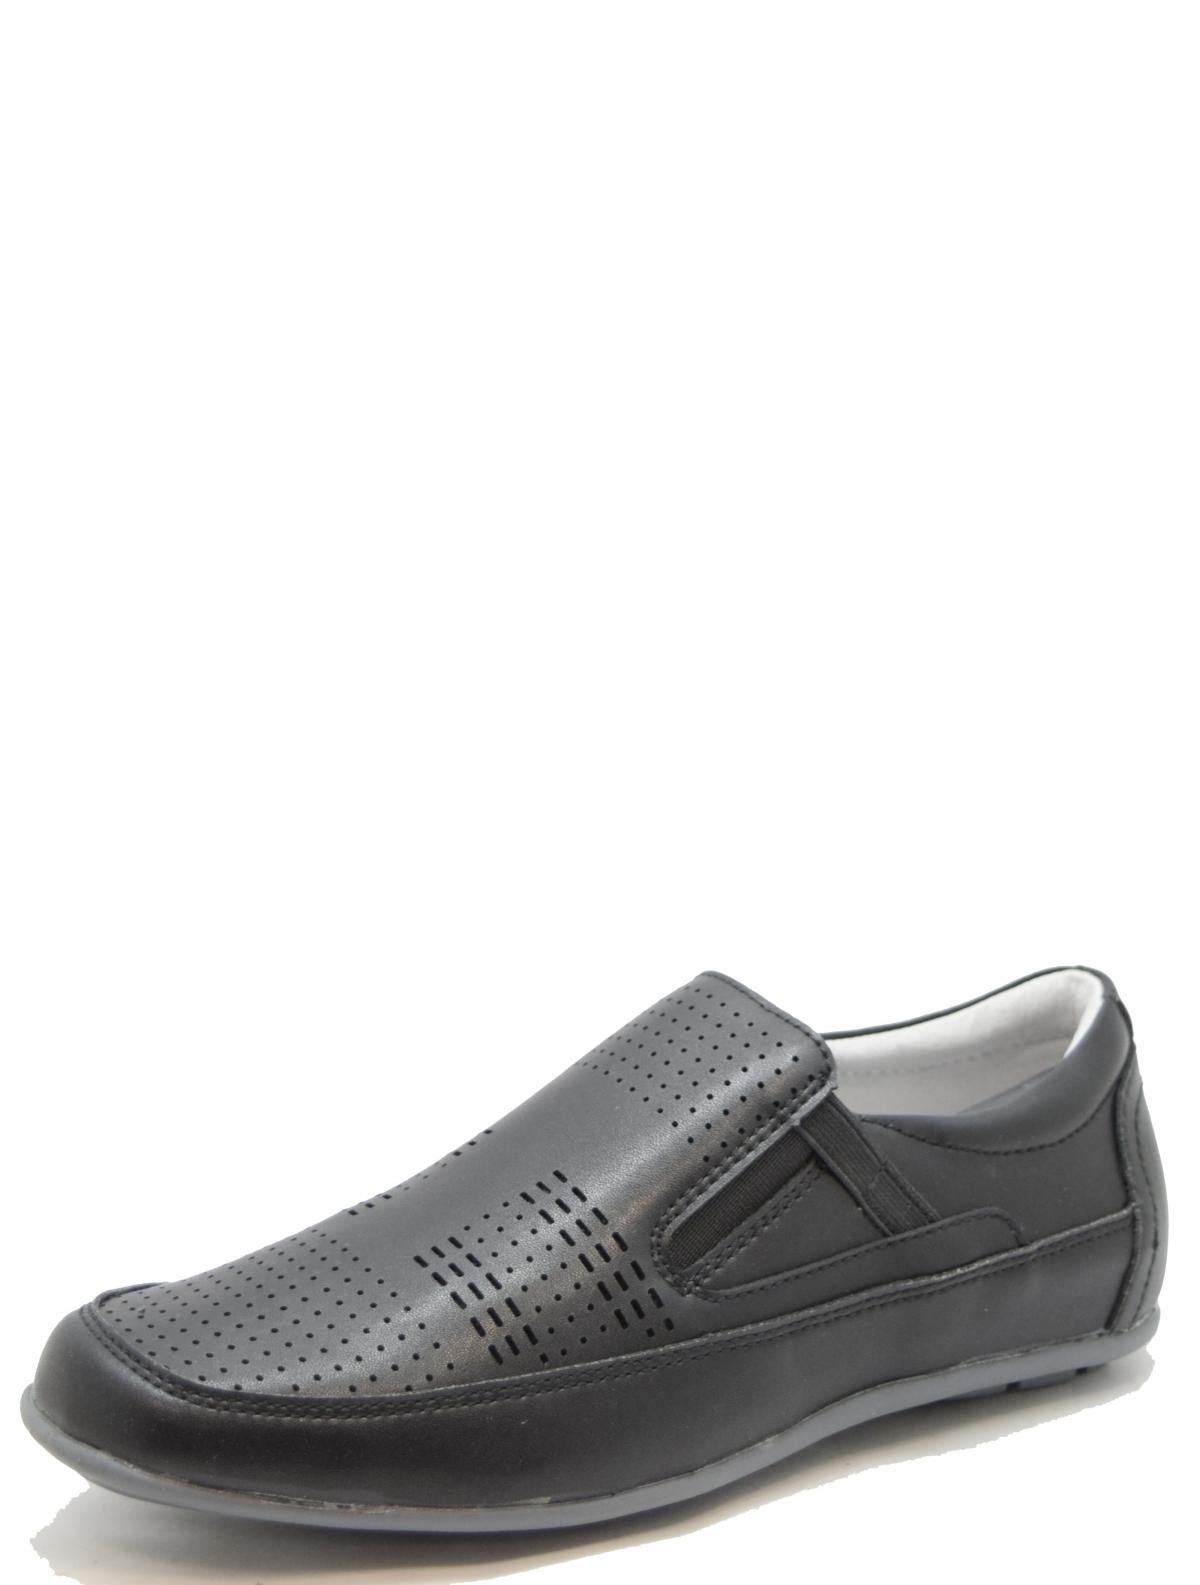 72T-XY-0297 туфли для мальчика